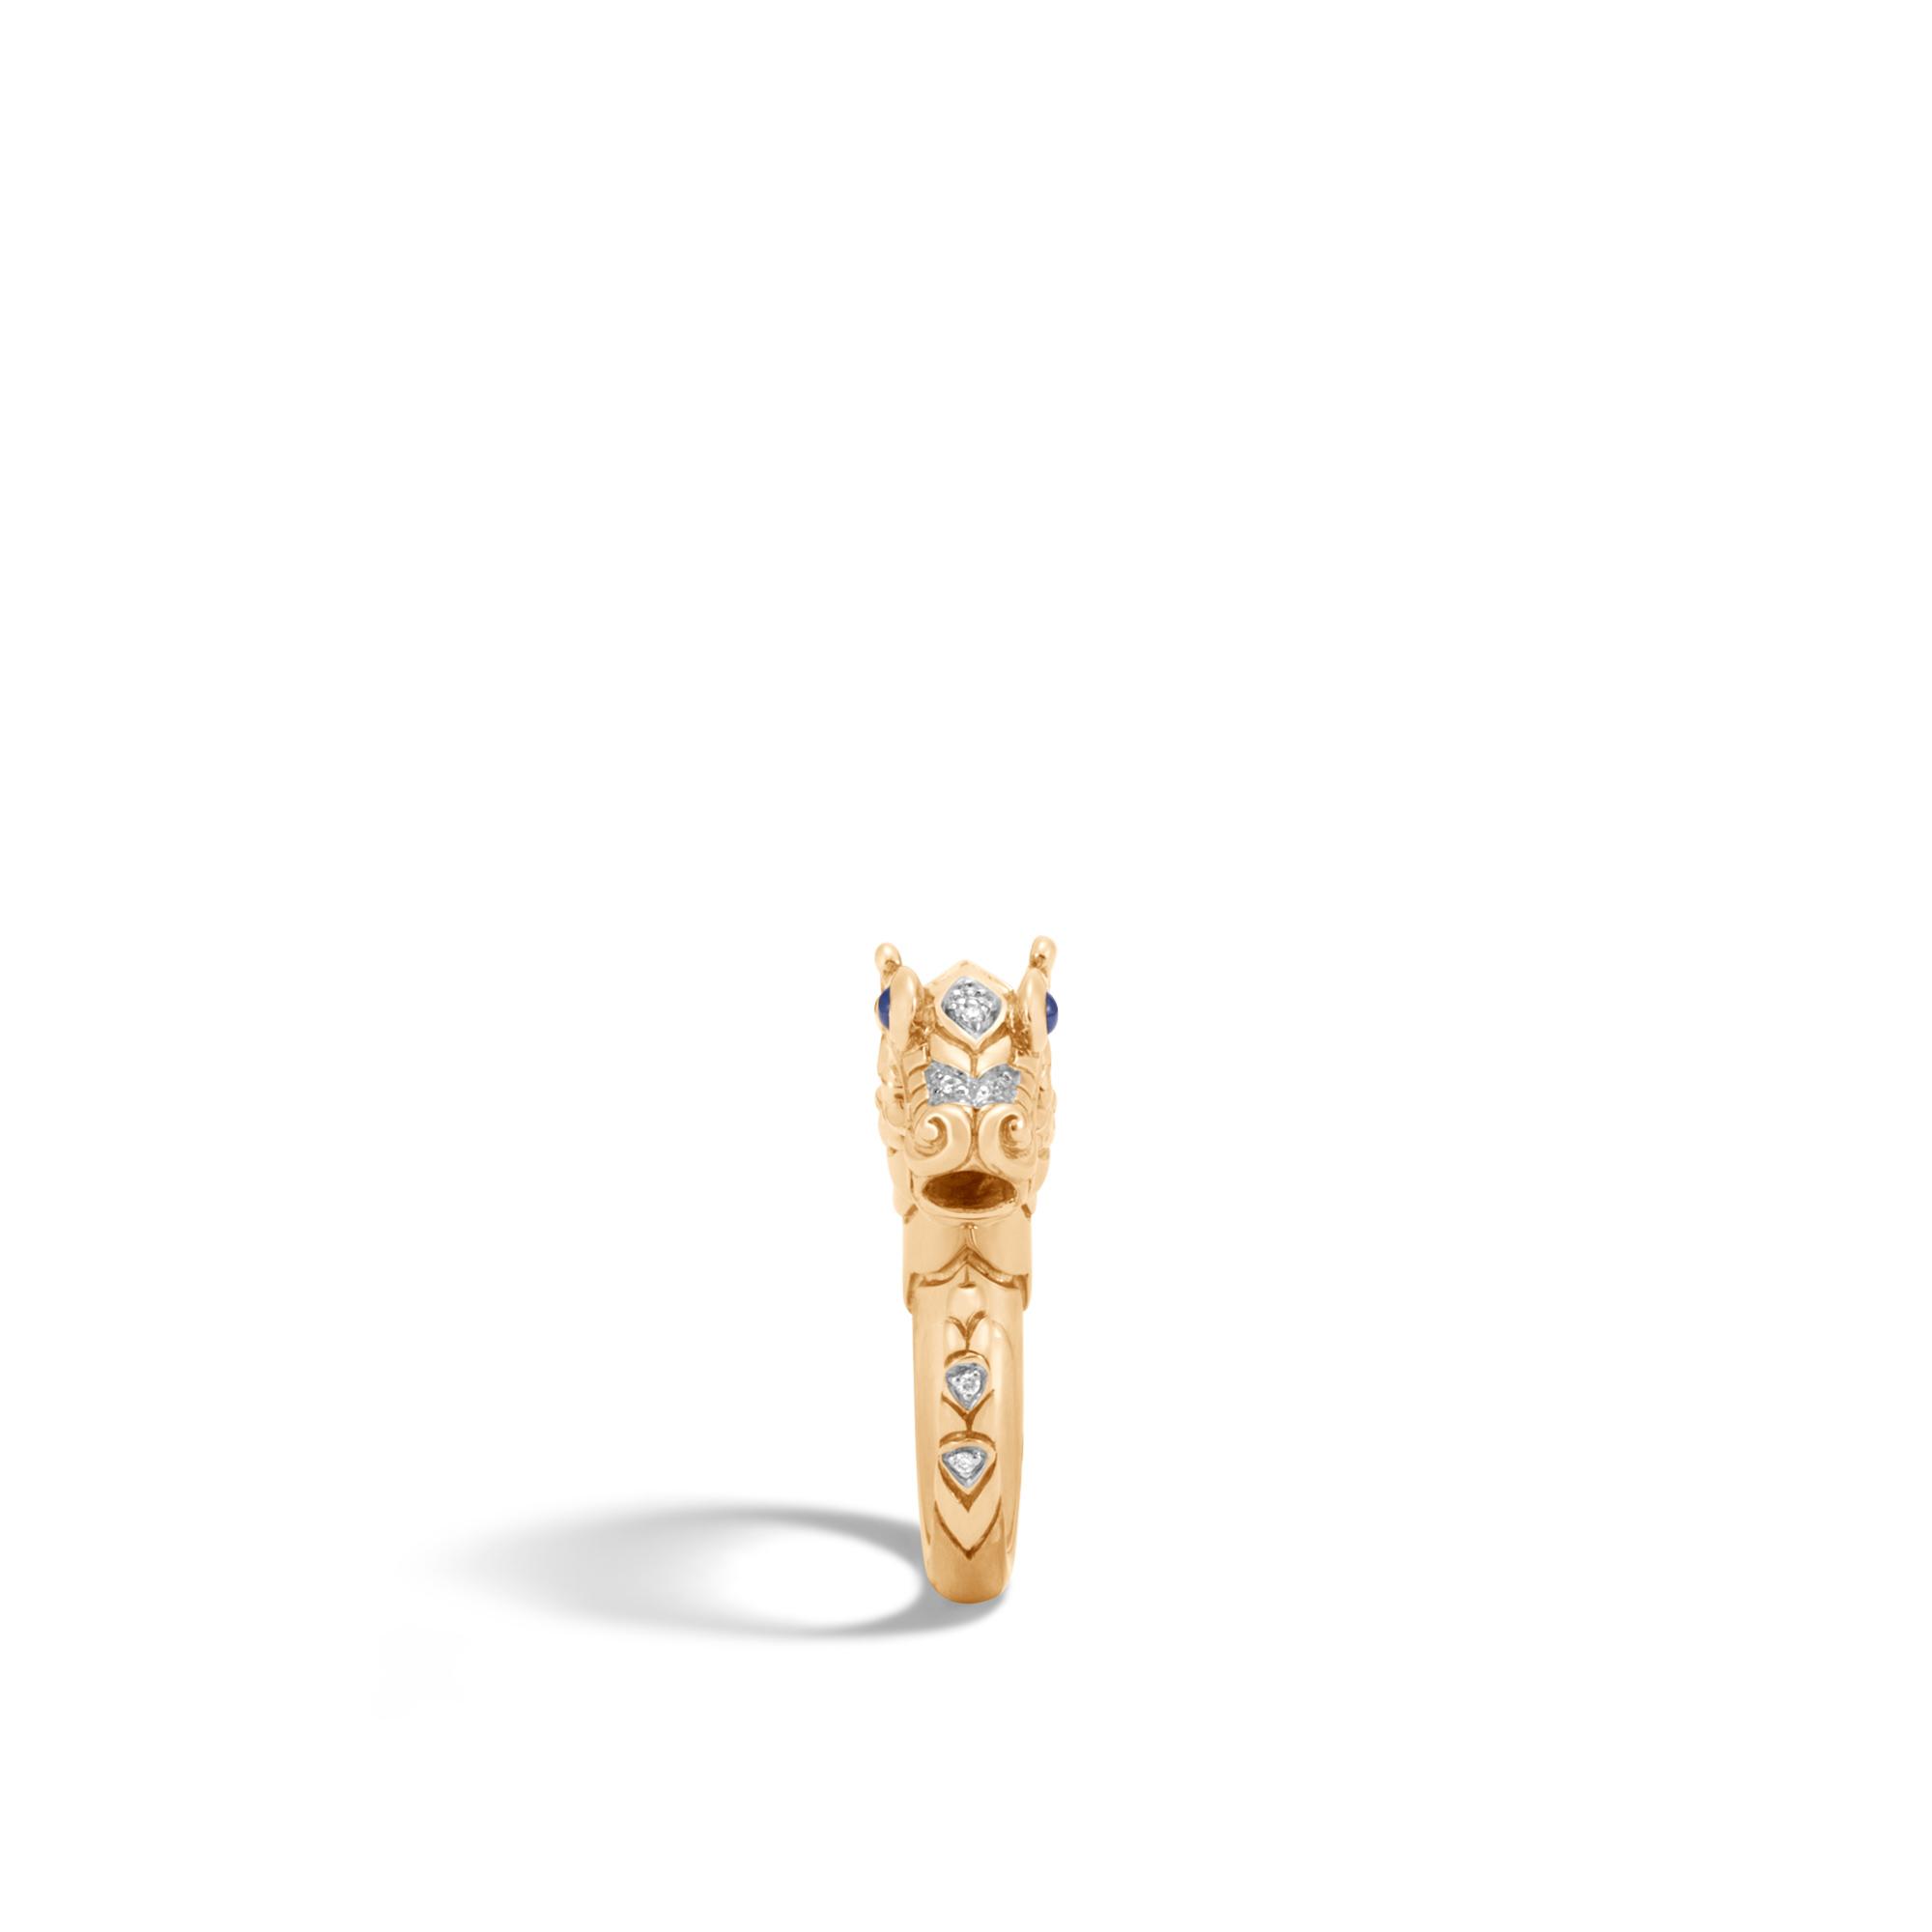 Legends Naga Ring in Brushed 18K Gold with Diamonds, White Diamond, large